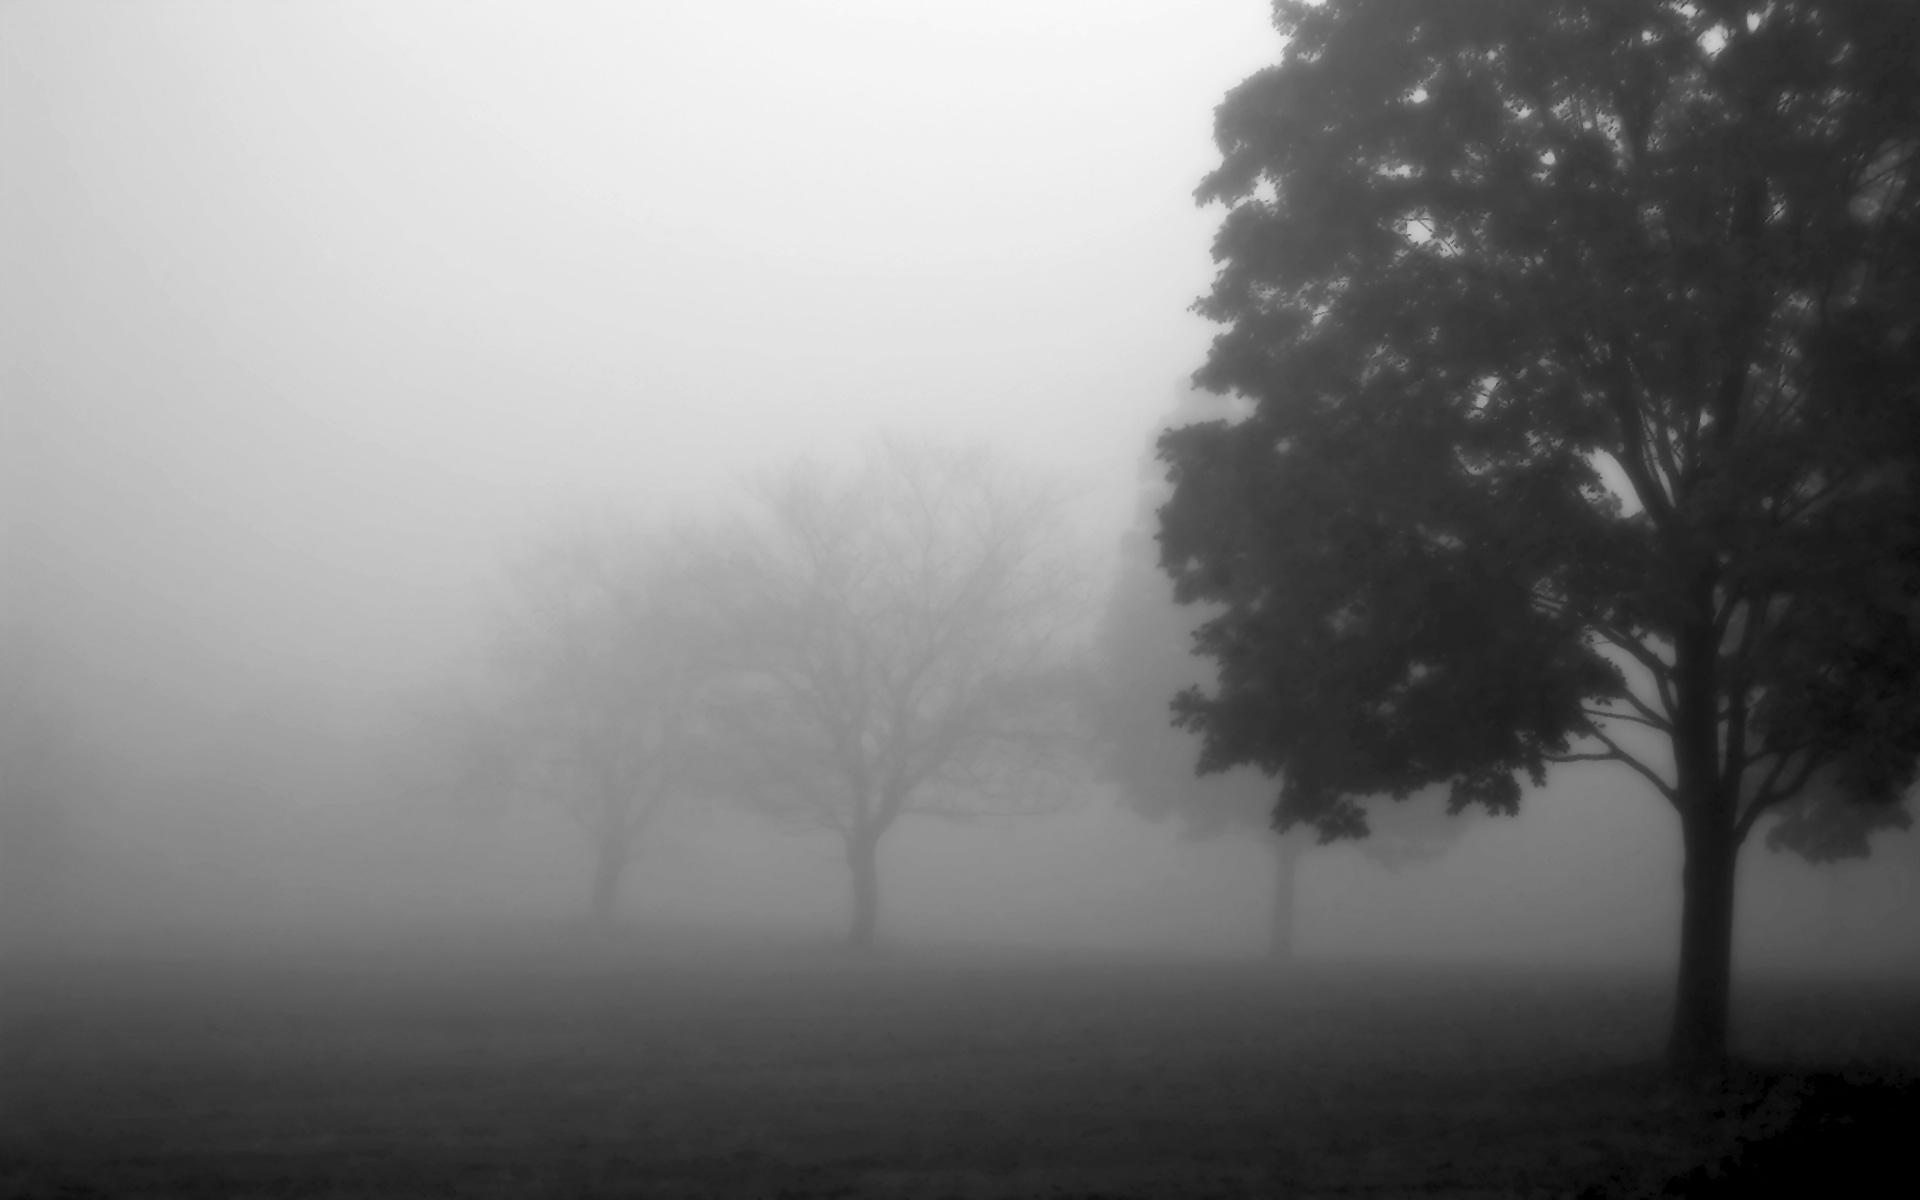 Foggy Trees by ryanstfu